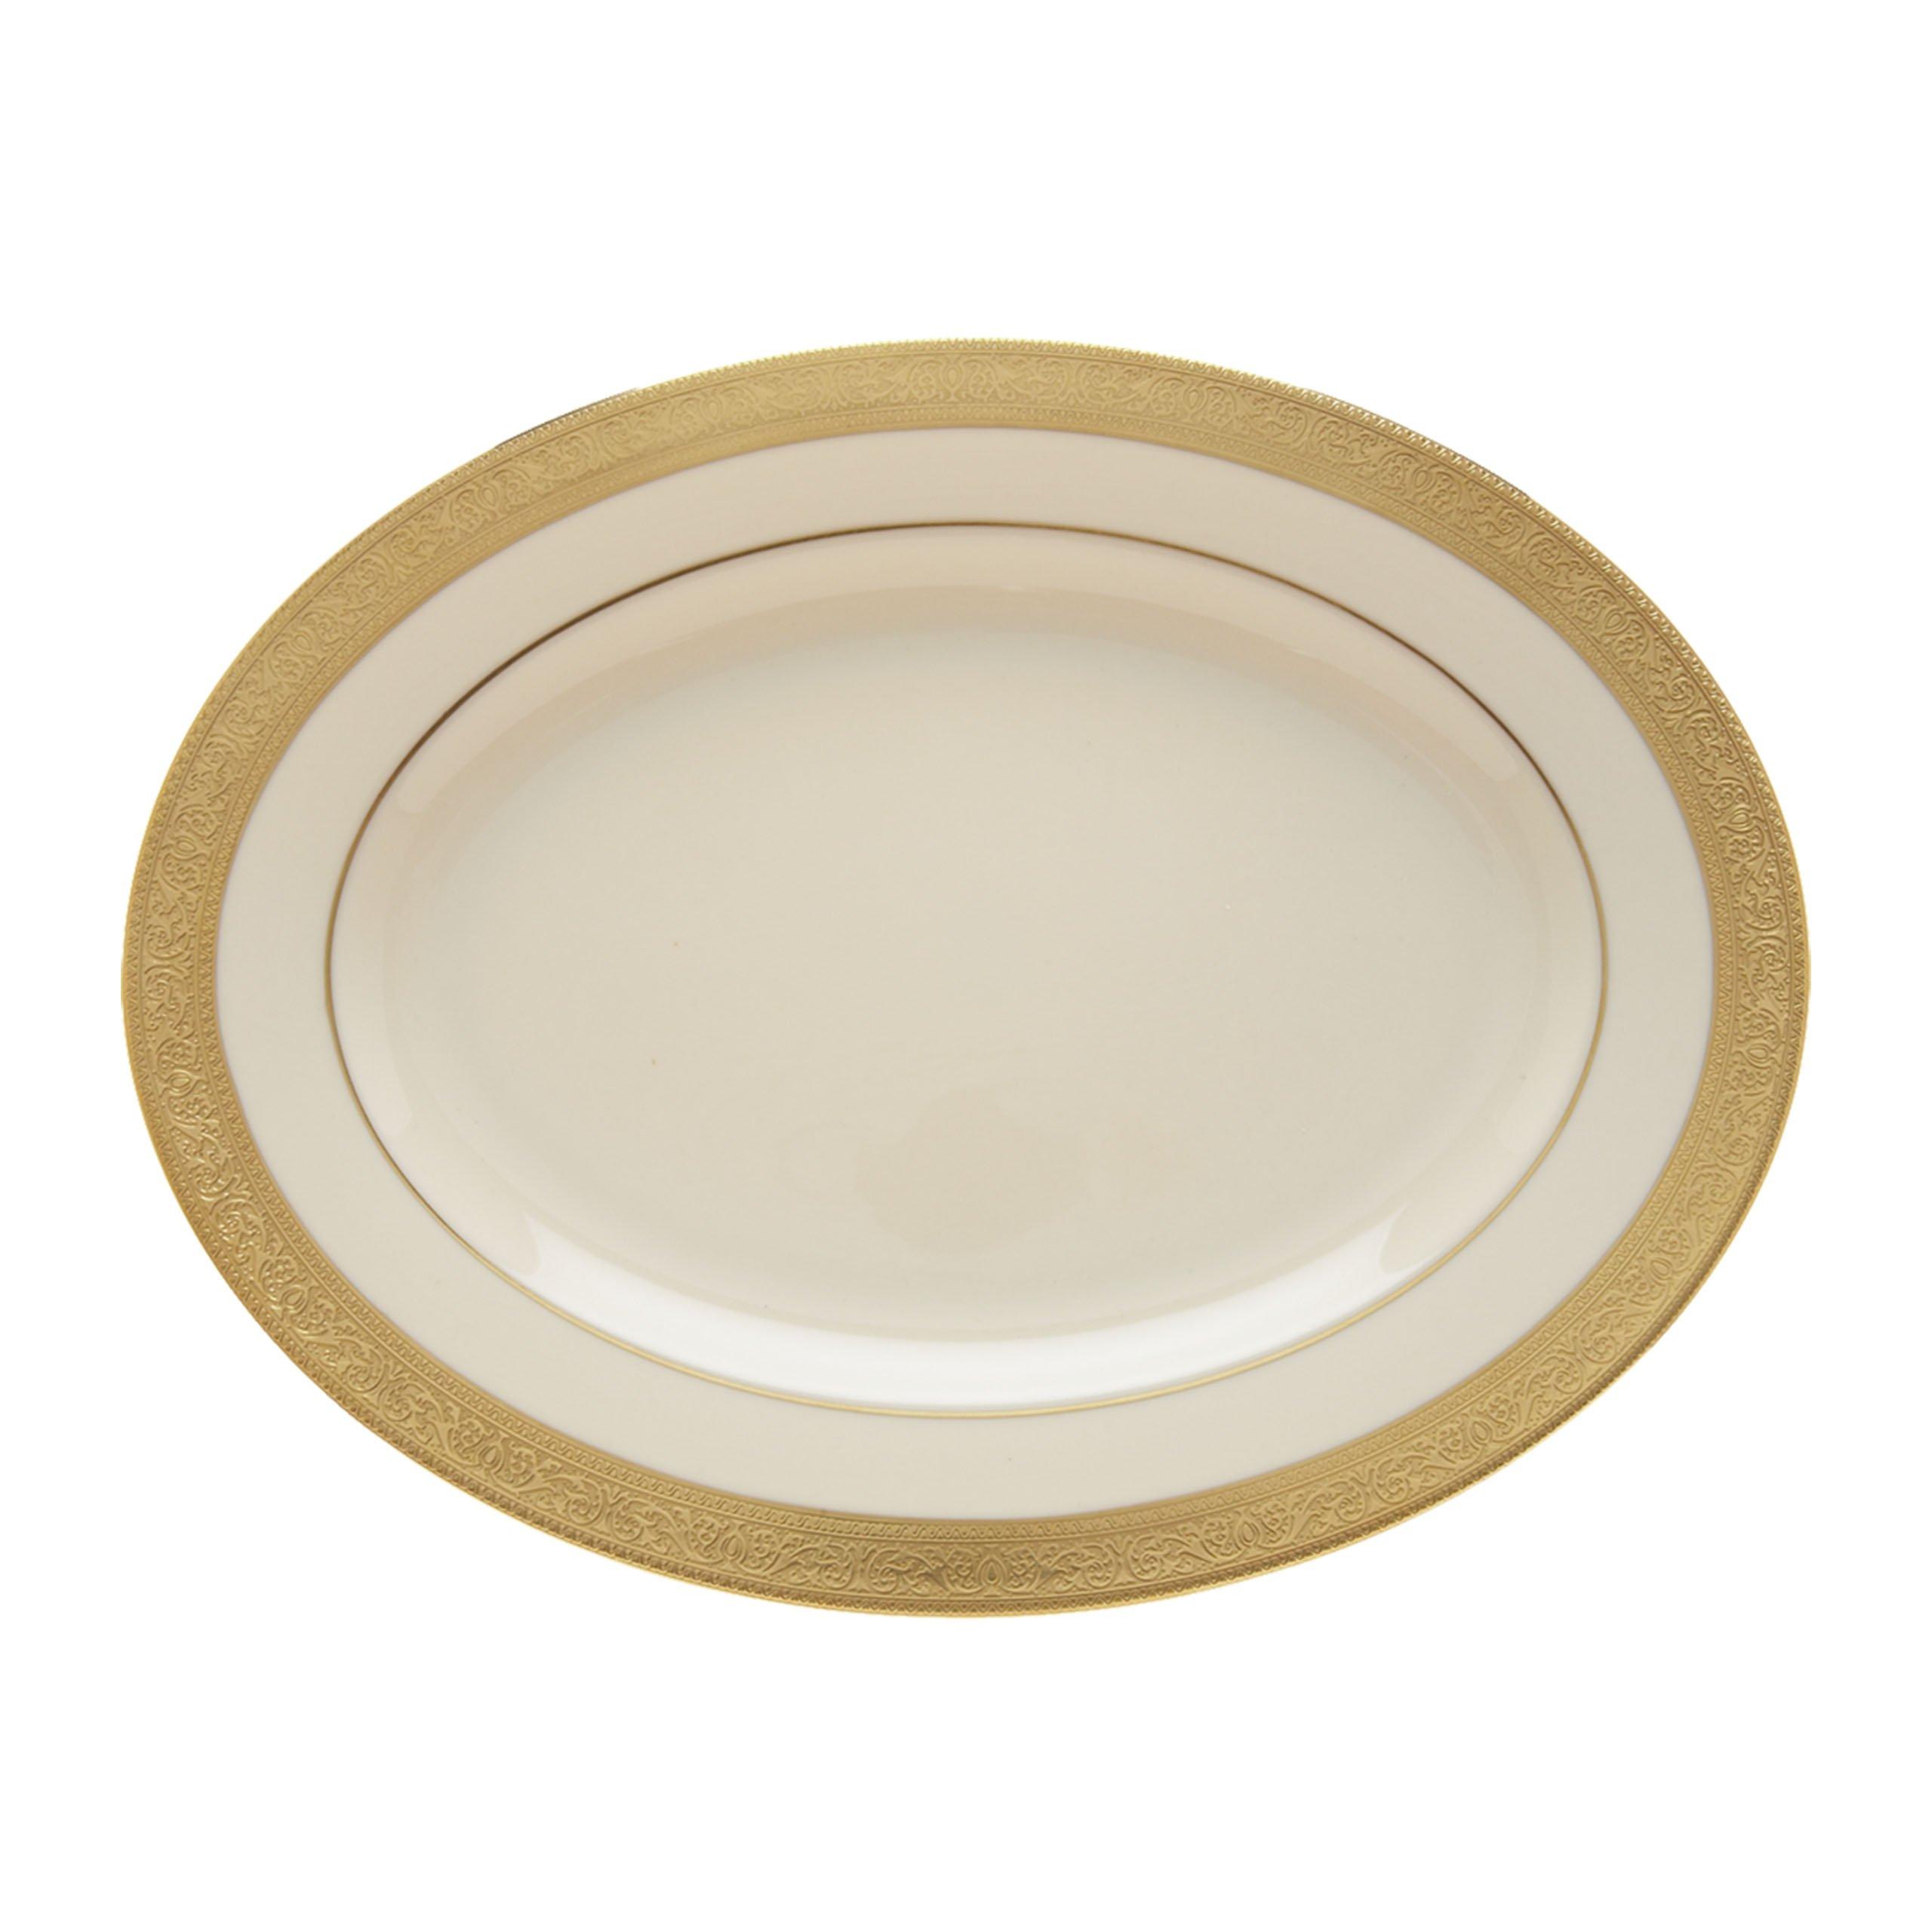 Lenox Westchester Oval Platter, 13-Inch